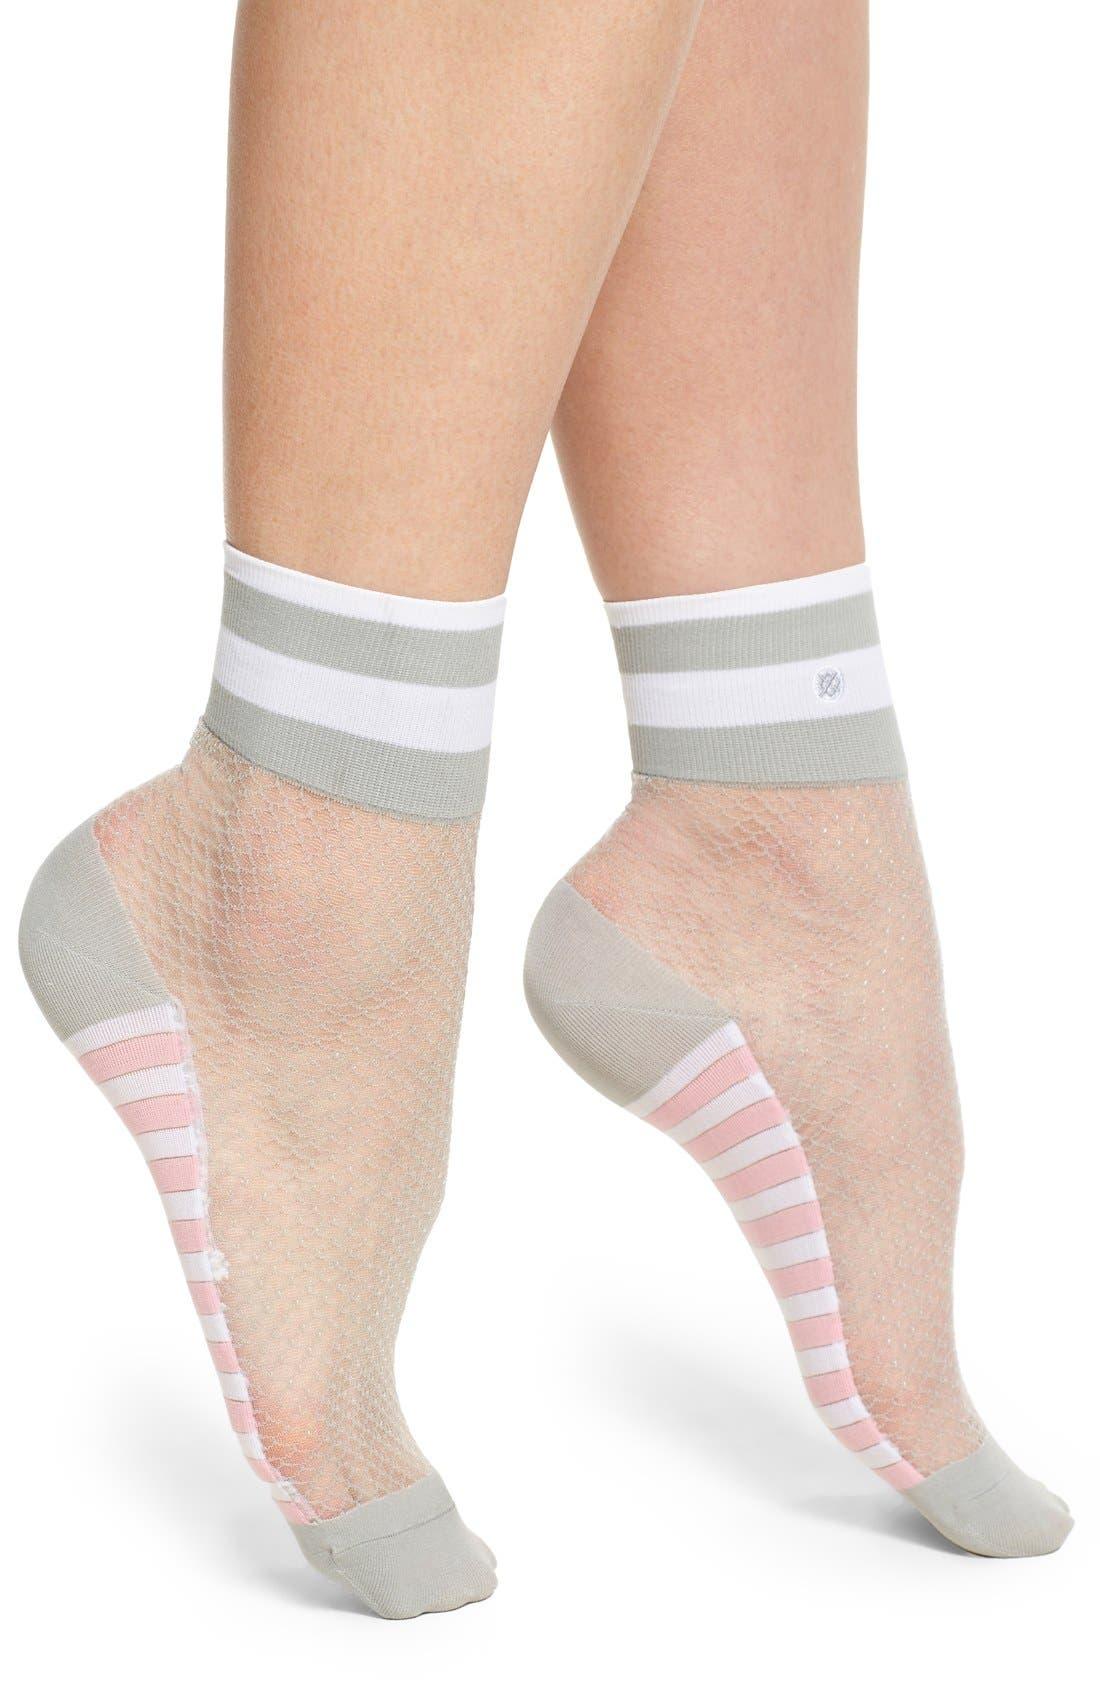 Alternate Image 1 Selected - Stance x Rihanna 'Spoiled Brat' Anklet Socks